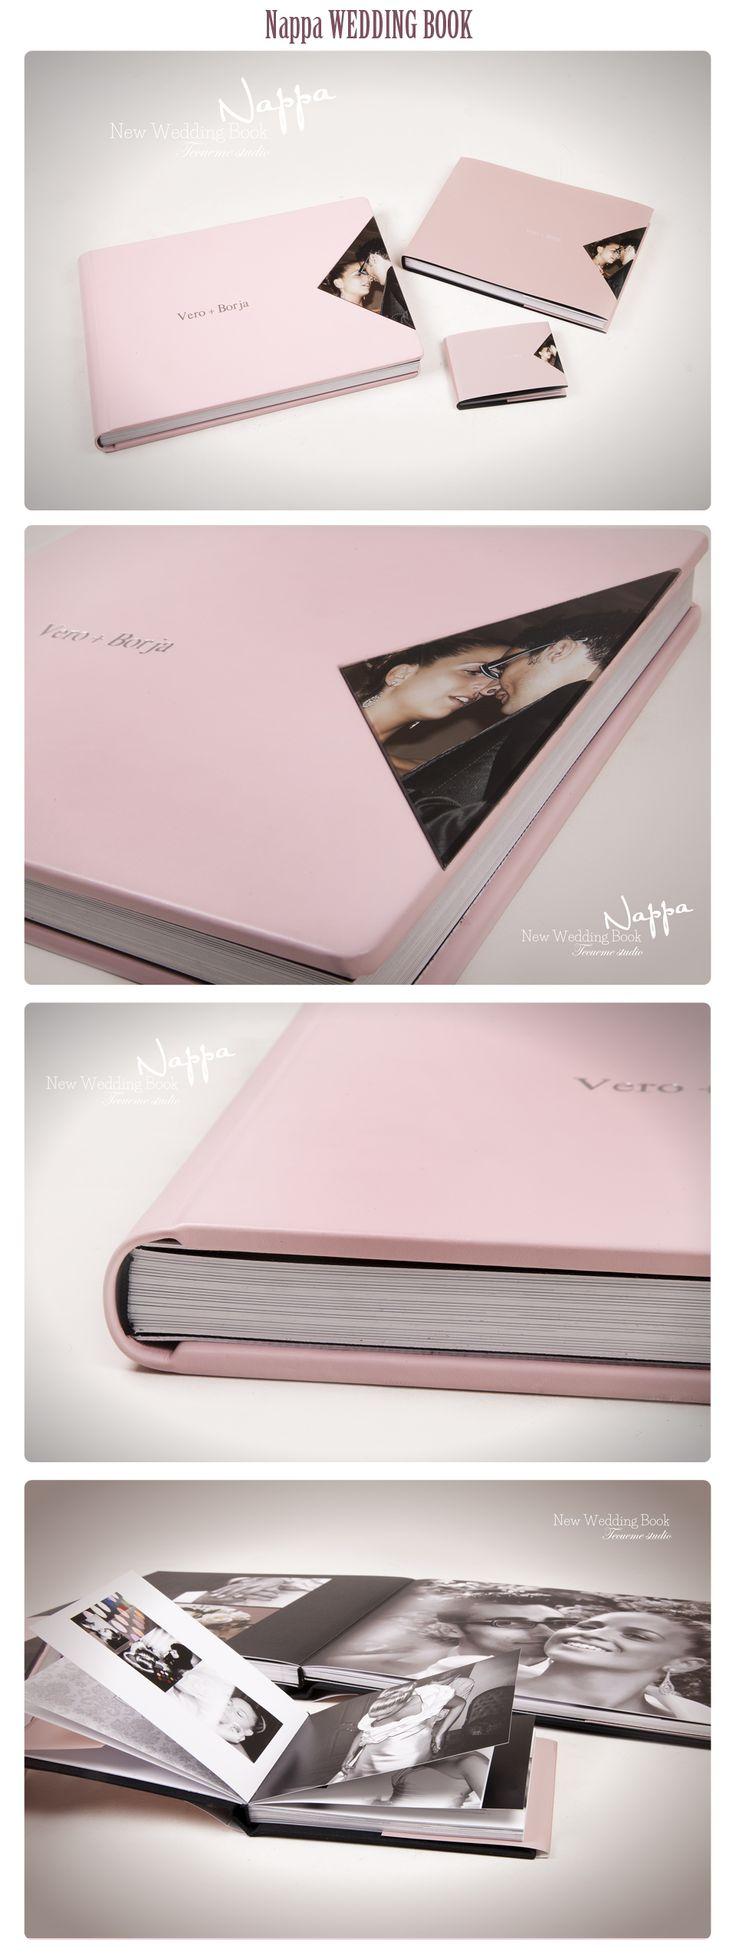 Ours Wedding Book -Wedding Album